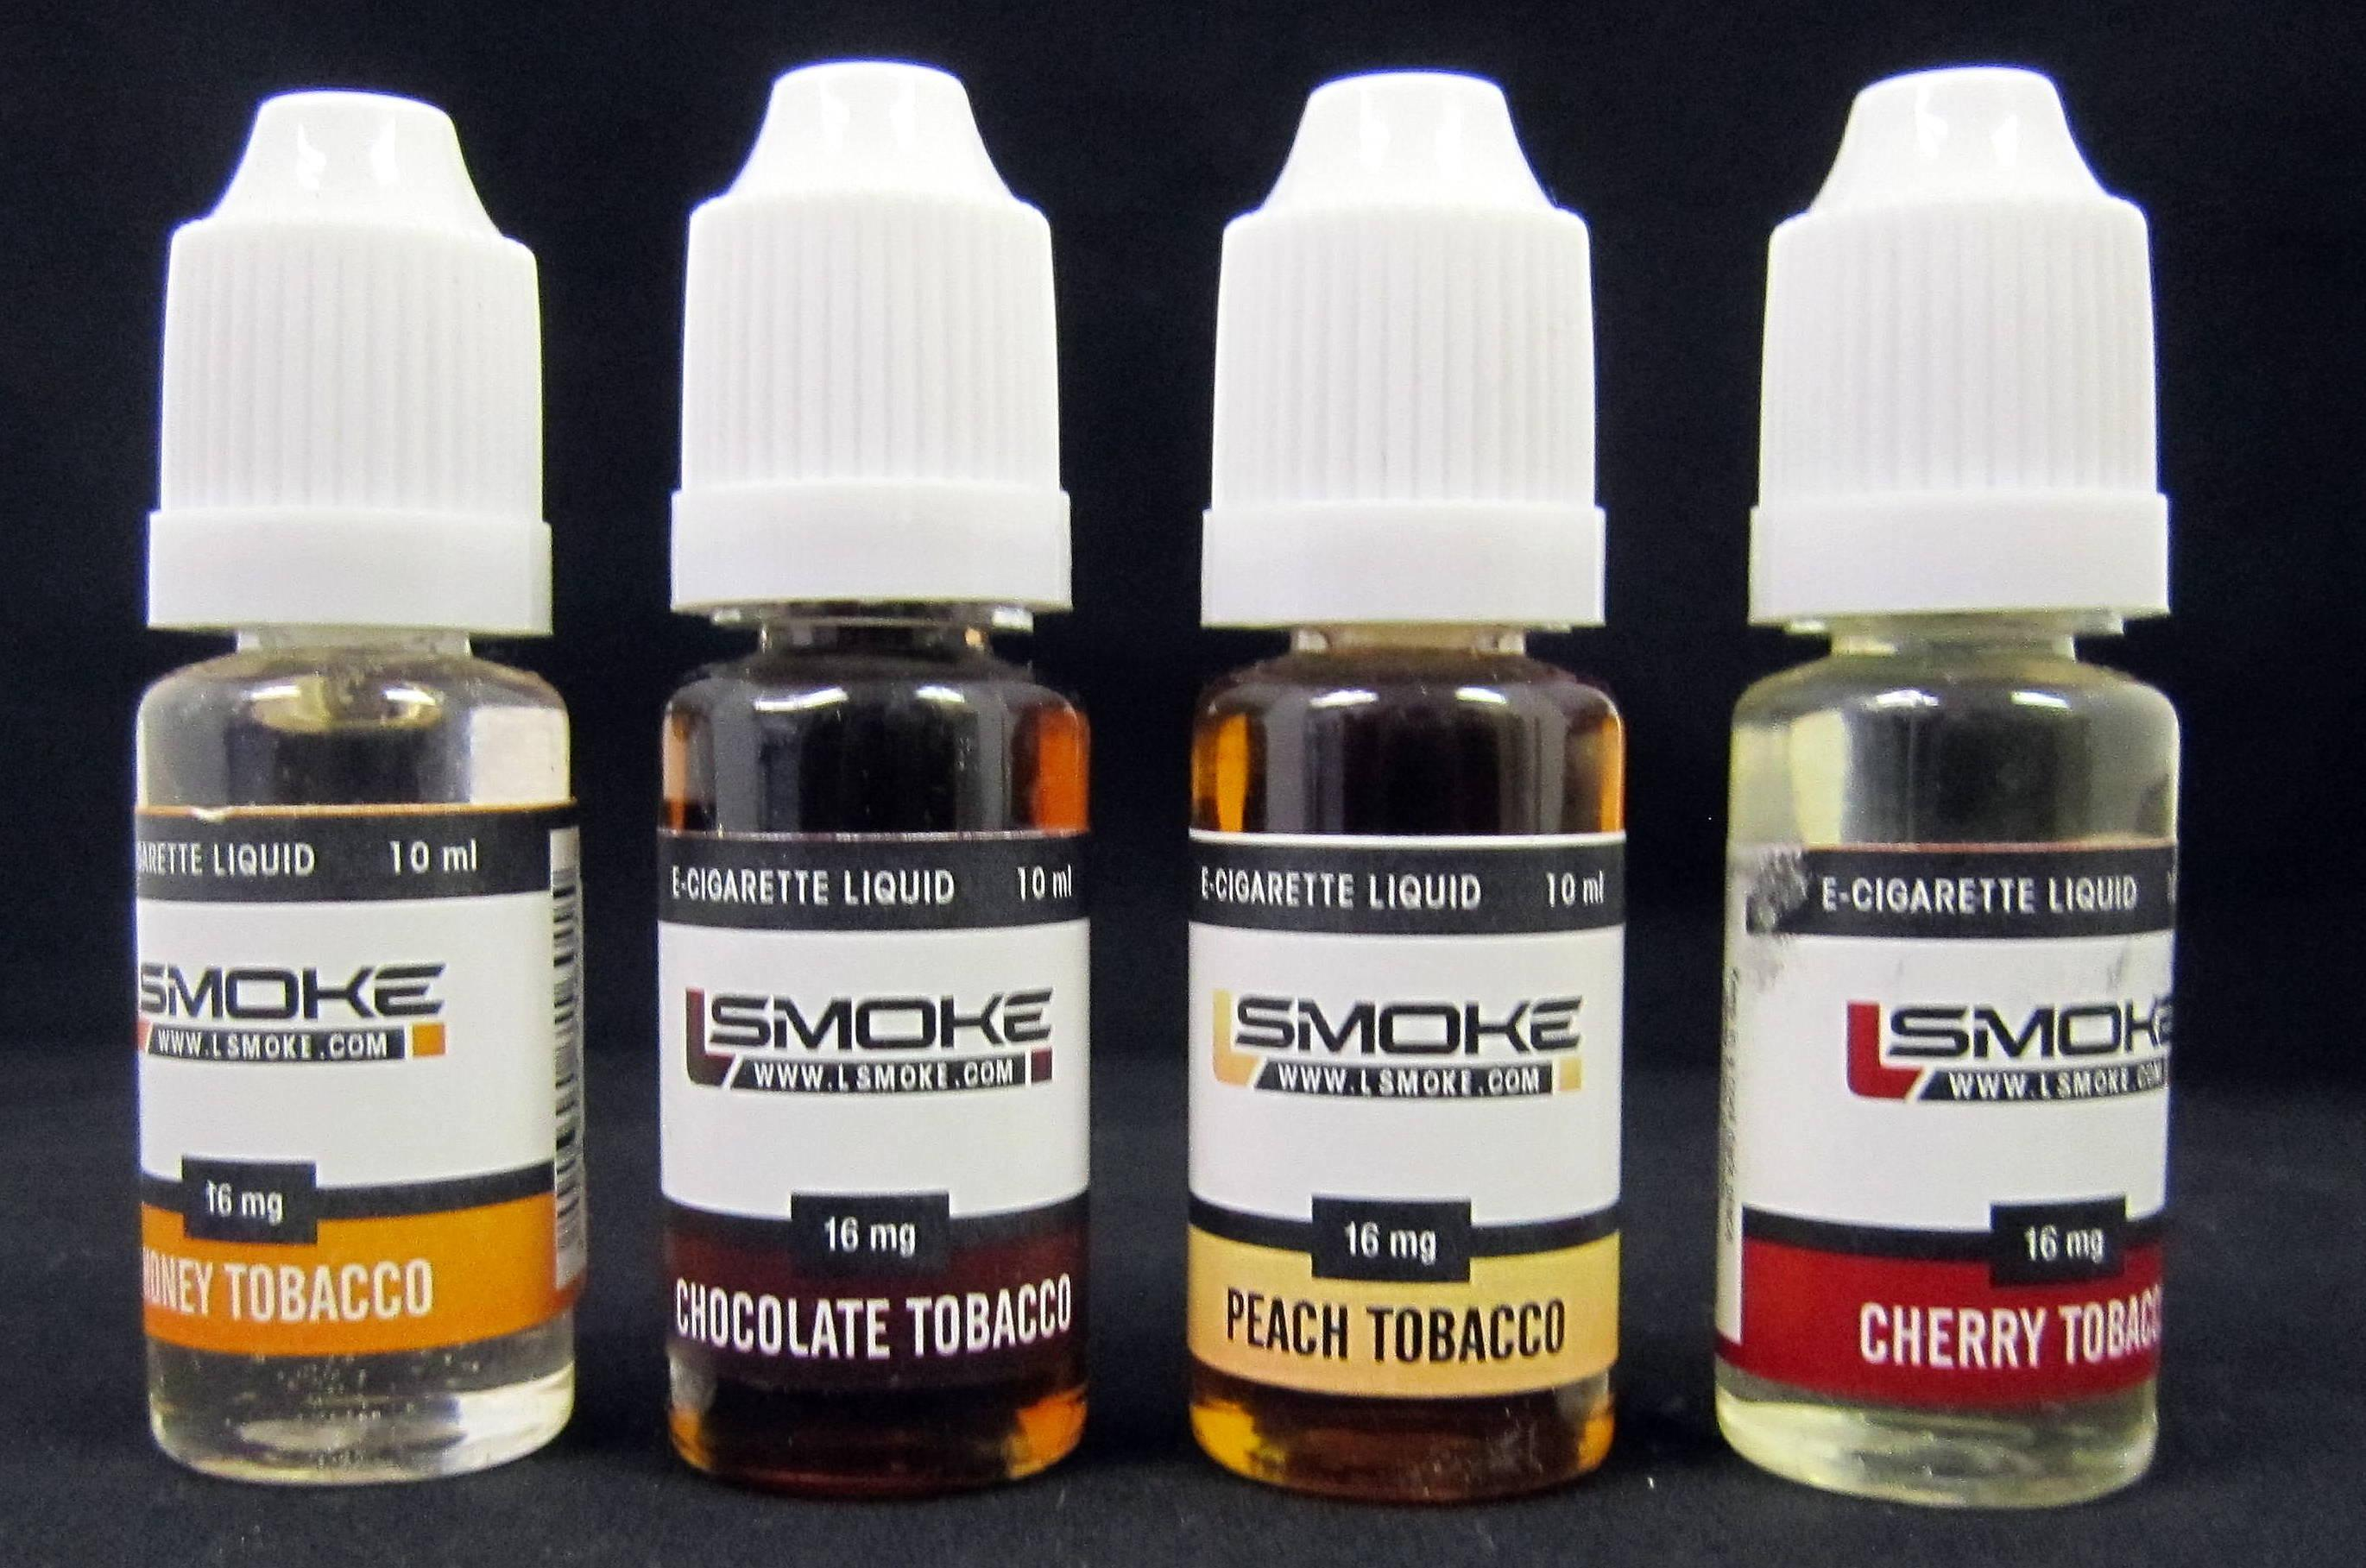 98faf6261704c02d4b6c_liquid-nicotine.jpg